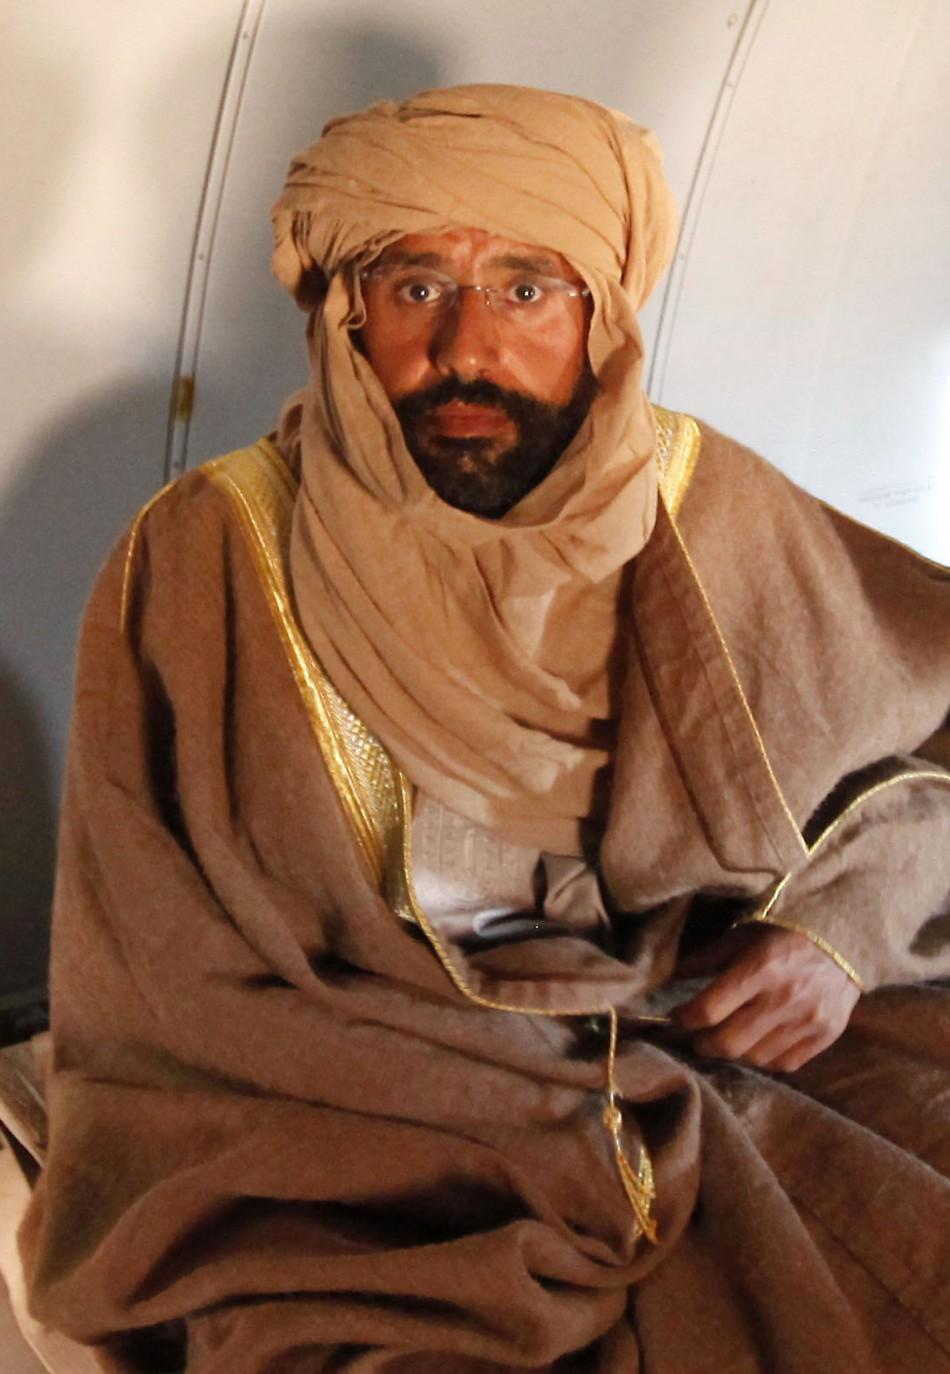 Saif Gaddafi sitting in Zintan after arrest on November 19